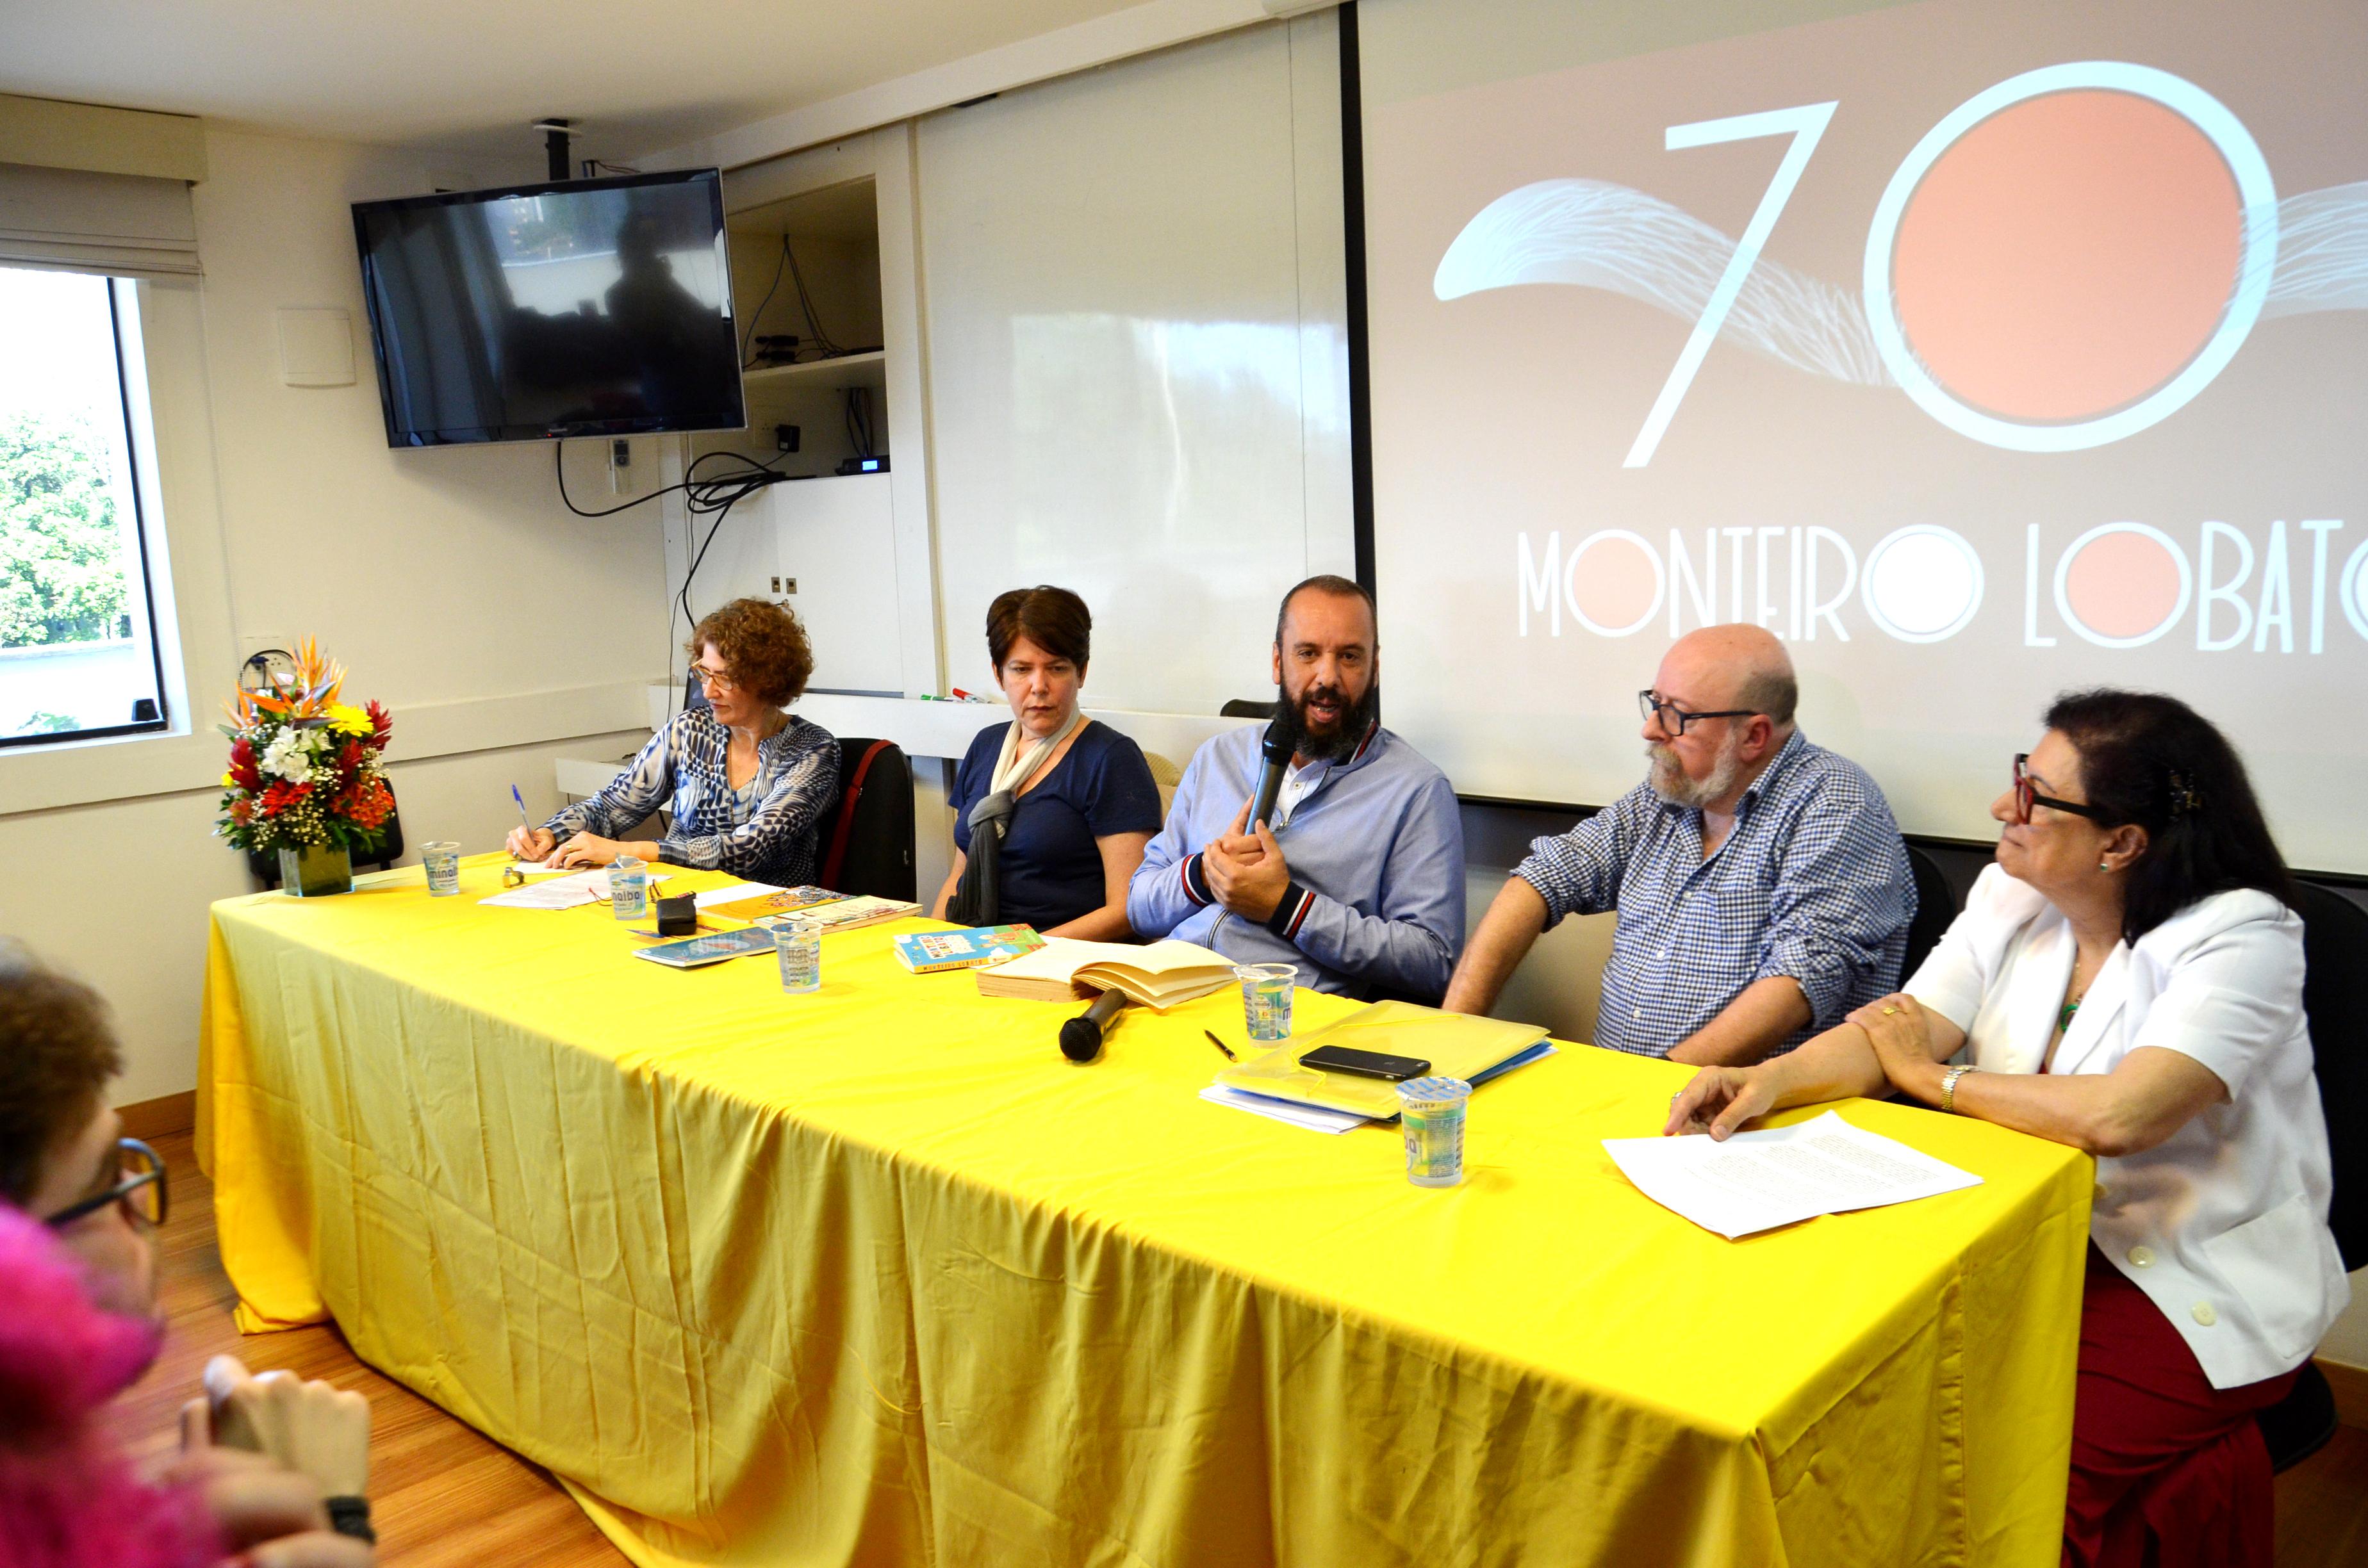 Mesa do Infanturas Monteiro LObato